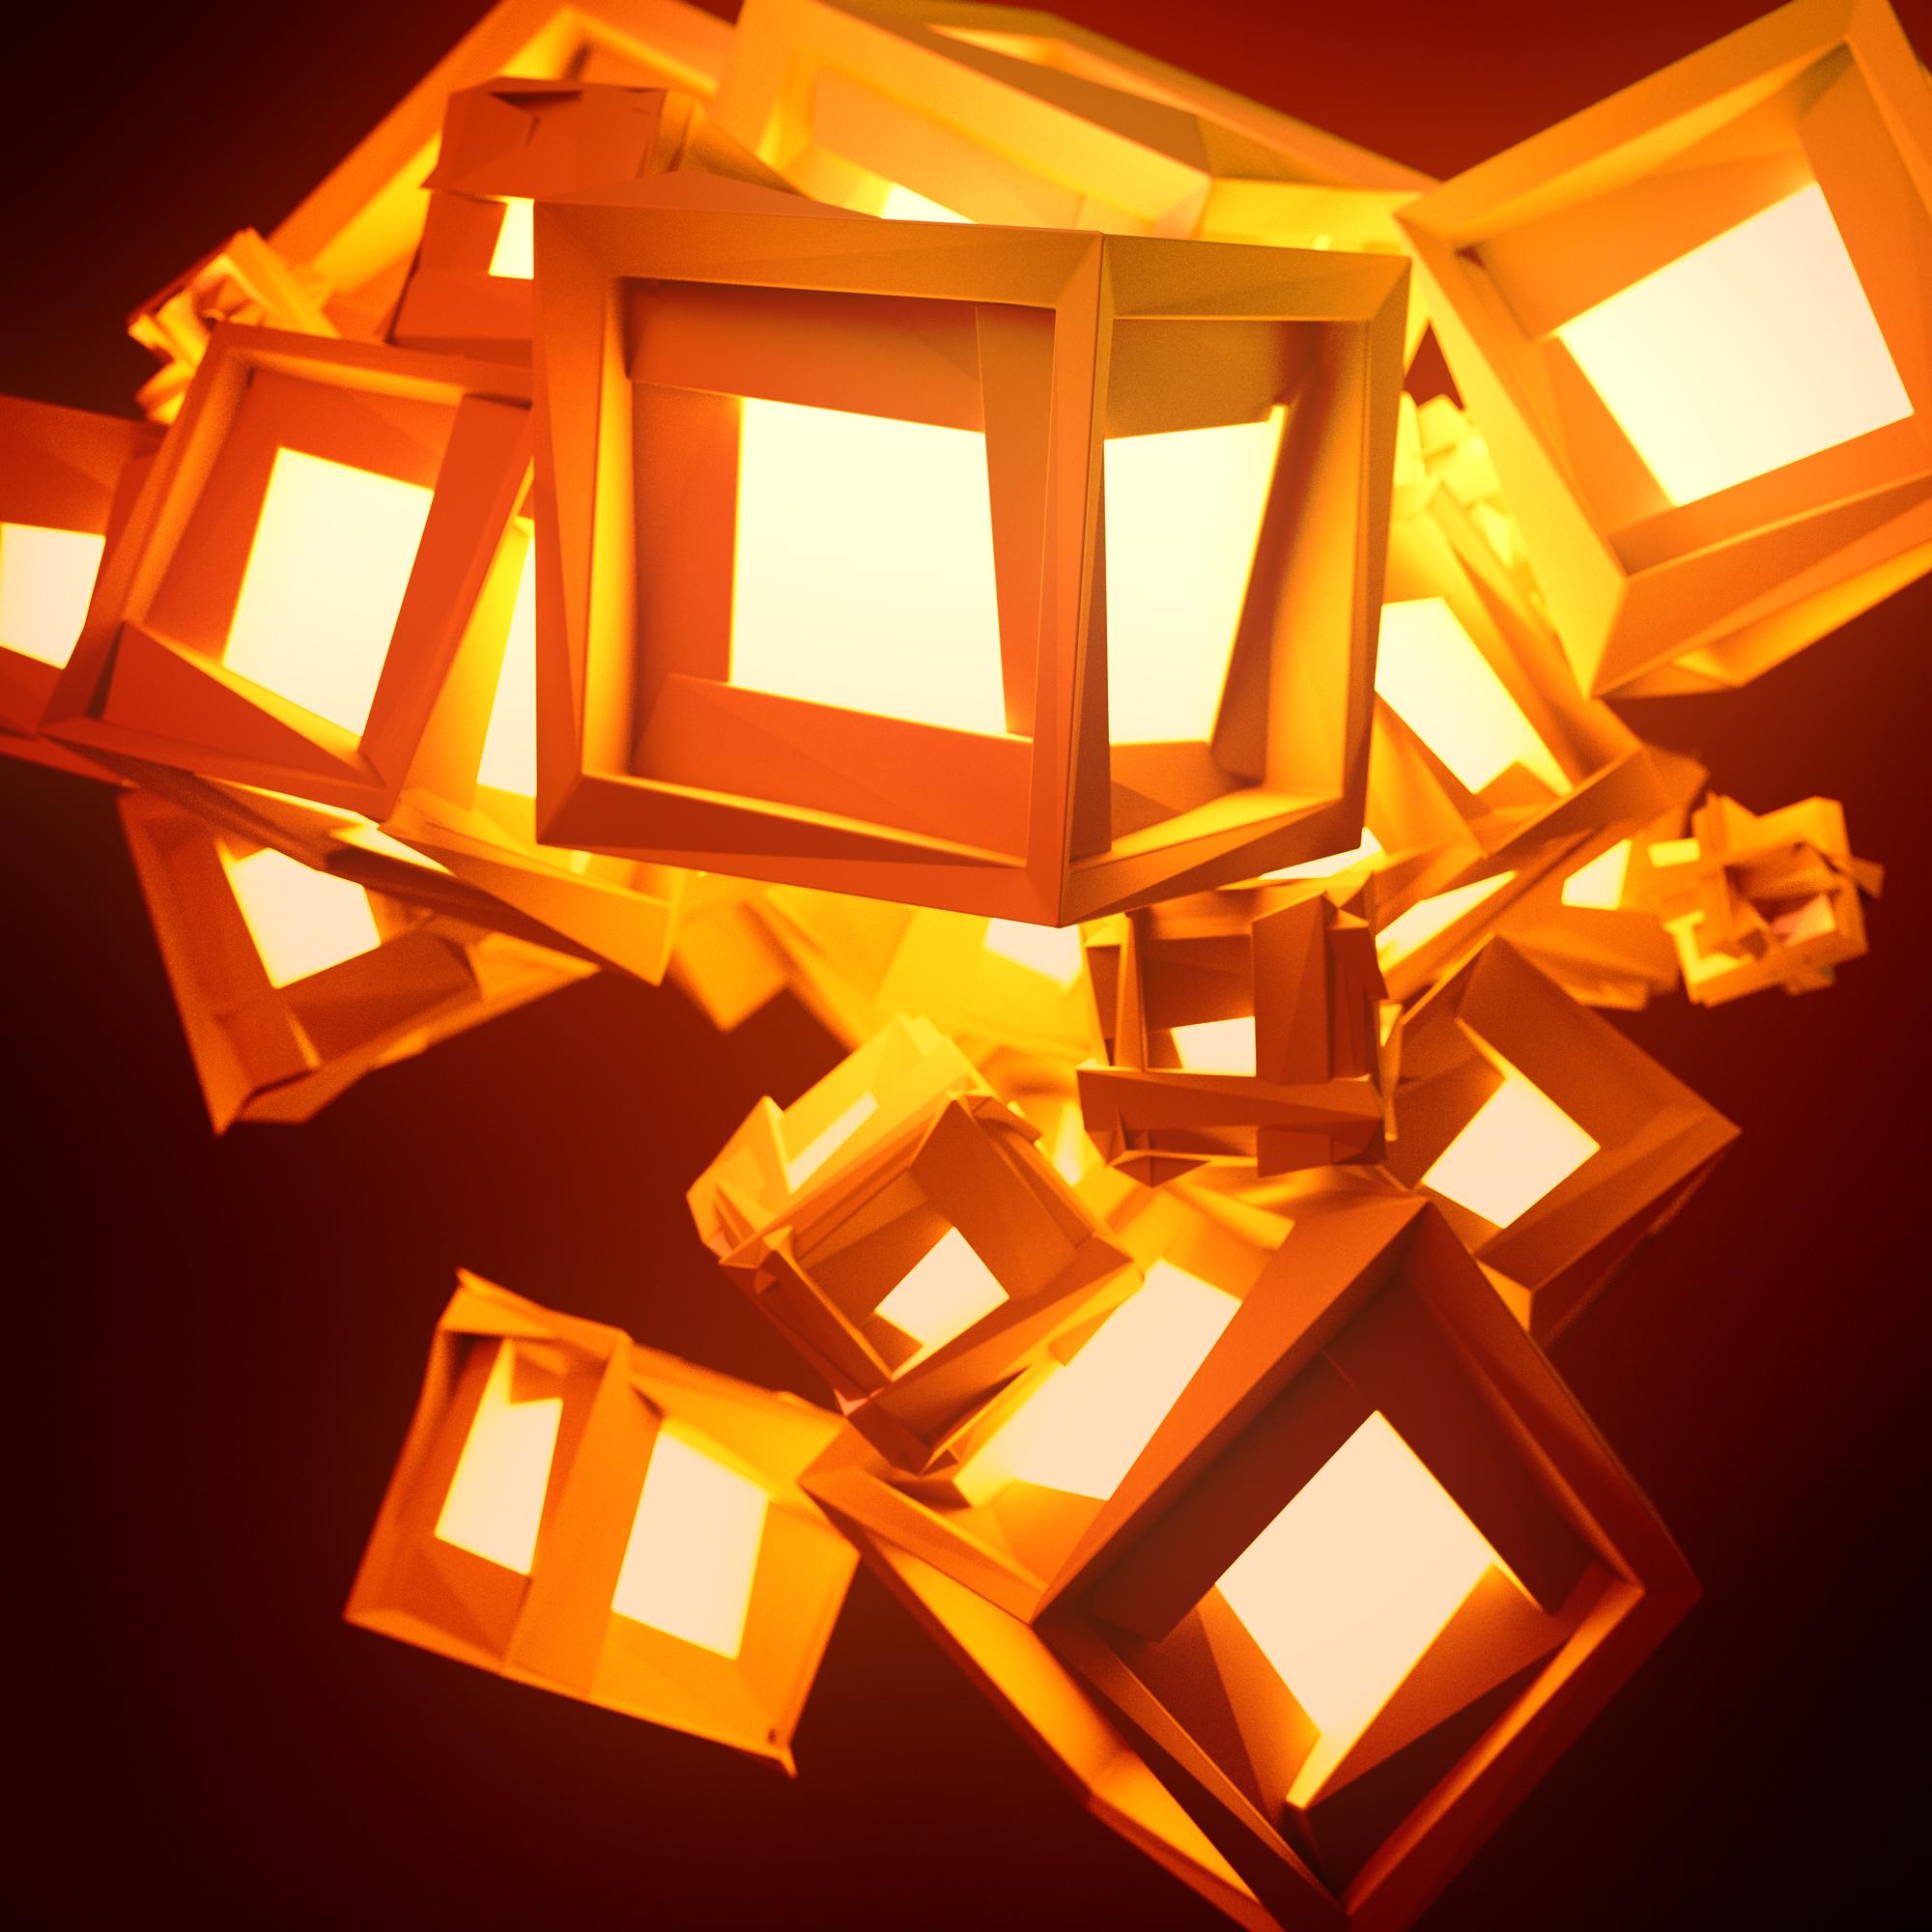 20141217_Cube_Lights_WEB.jpg